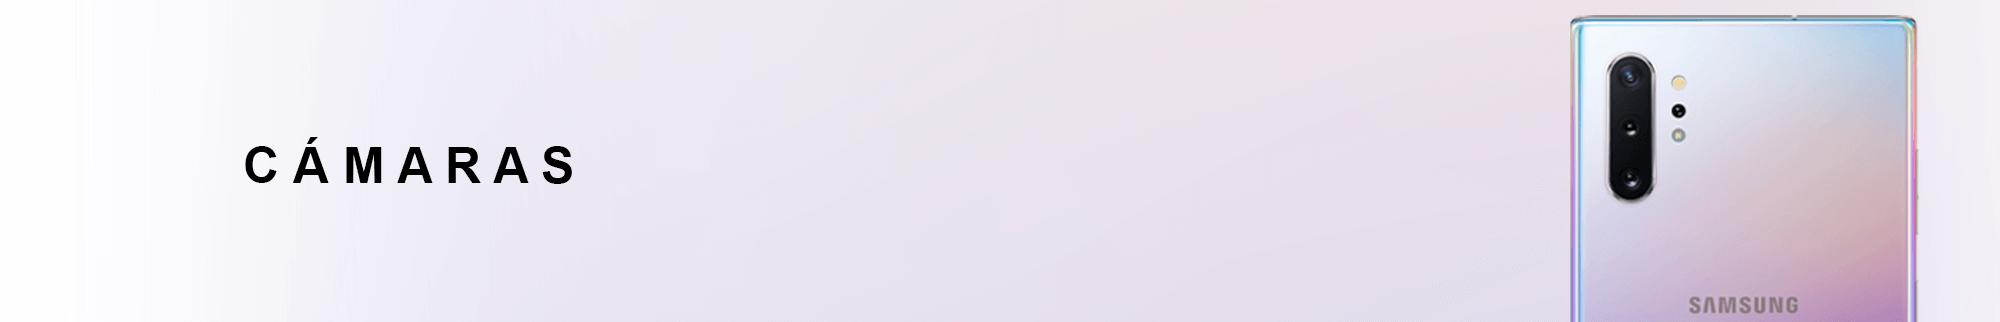 diseño-note-10+